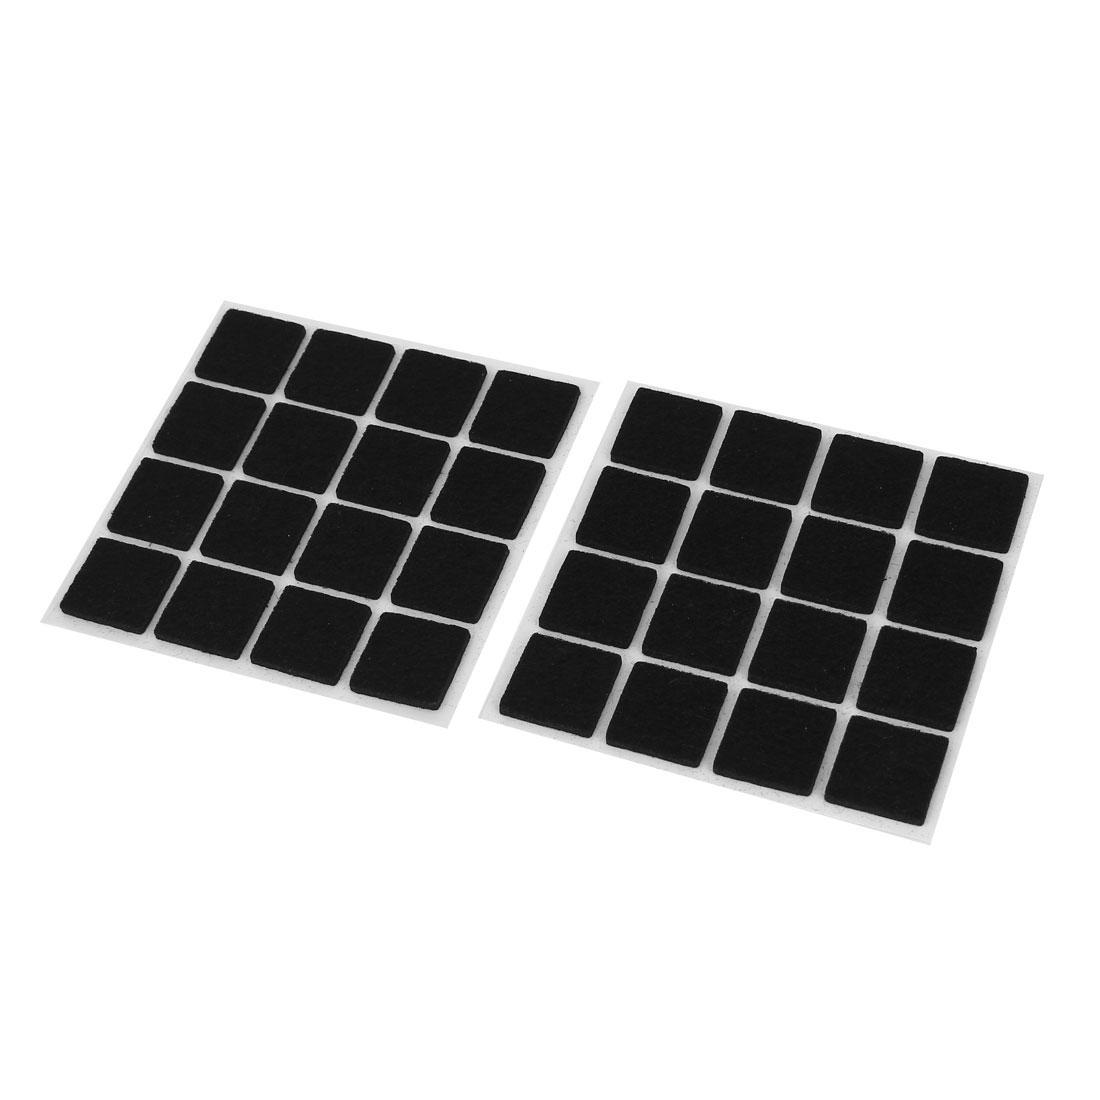 32pcs Self Adhesive Floor Protectors Furniture Felt Square Chair Sofa Table Pads